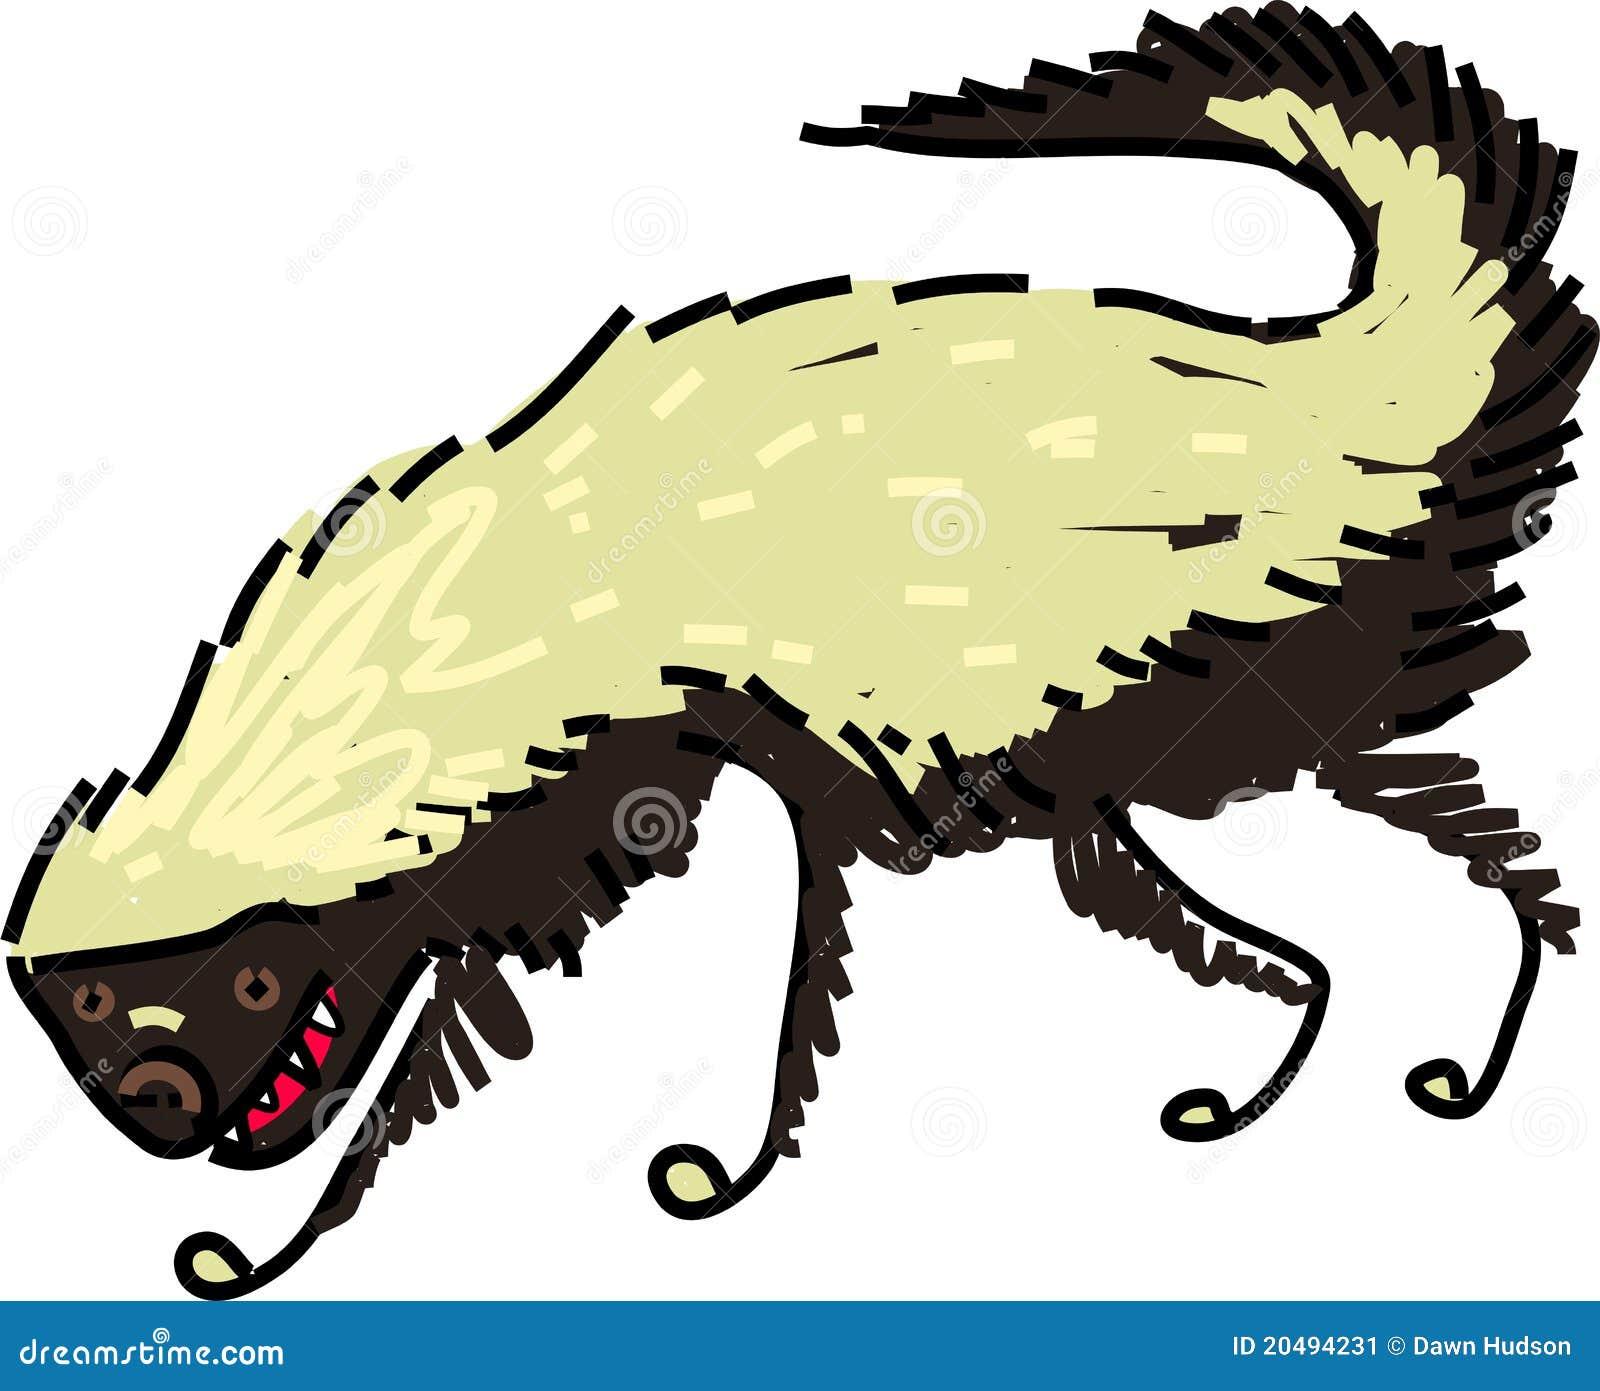 badger stock illustrations 1 178 badger stock illustrations rh dreamstime com badge clipart honey badger clipart